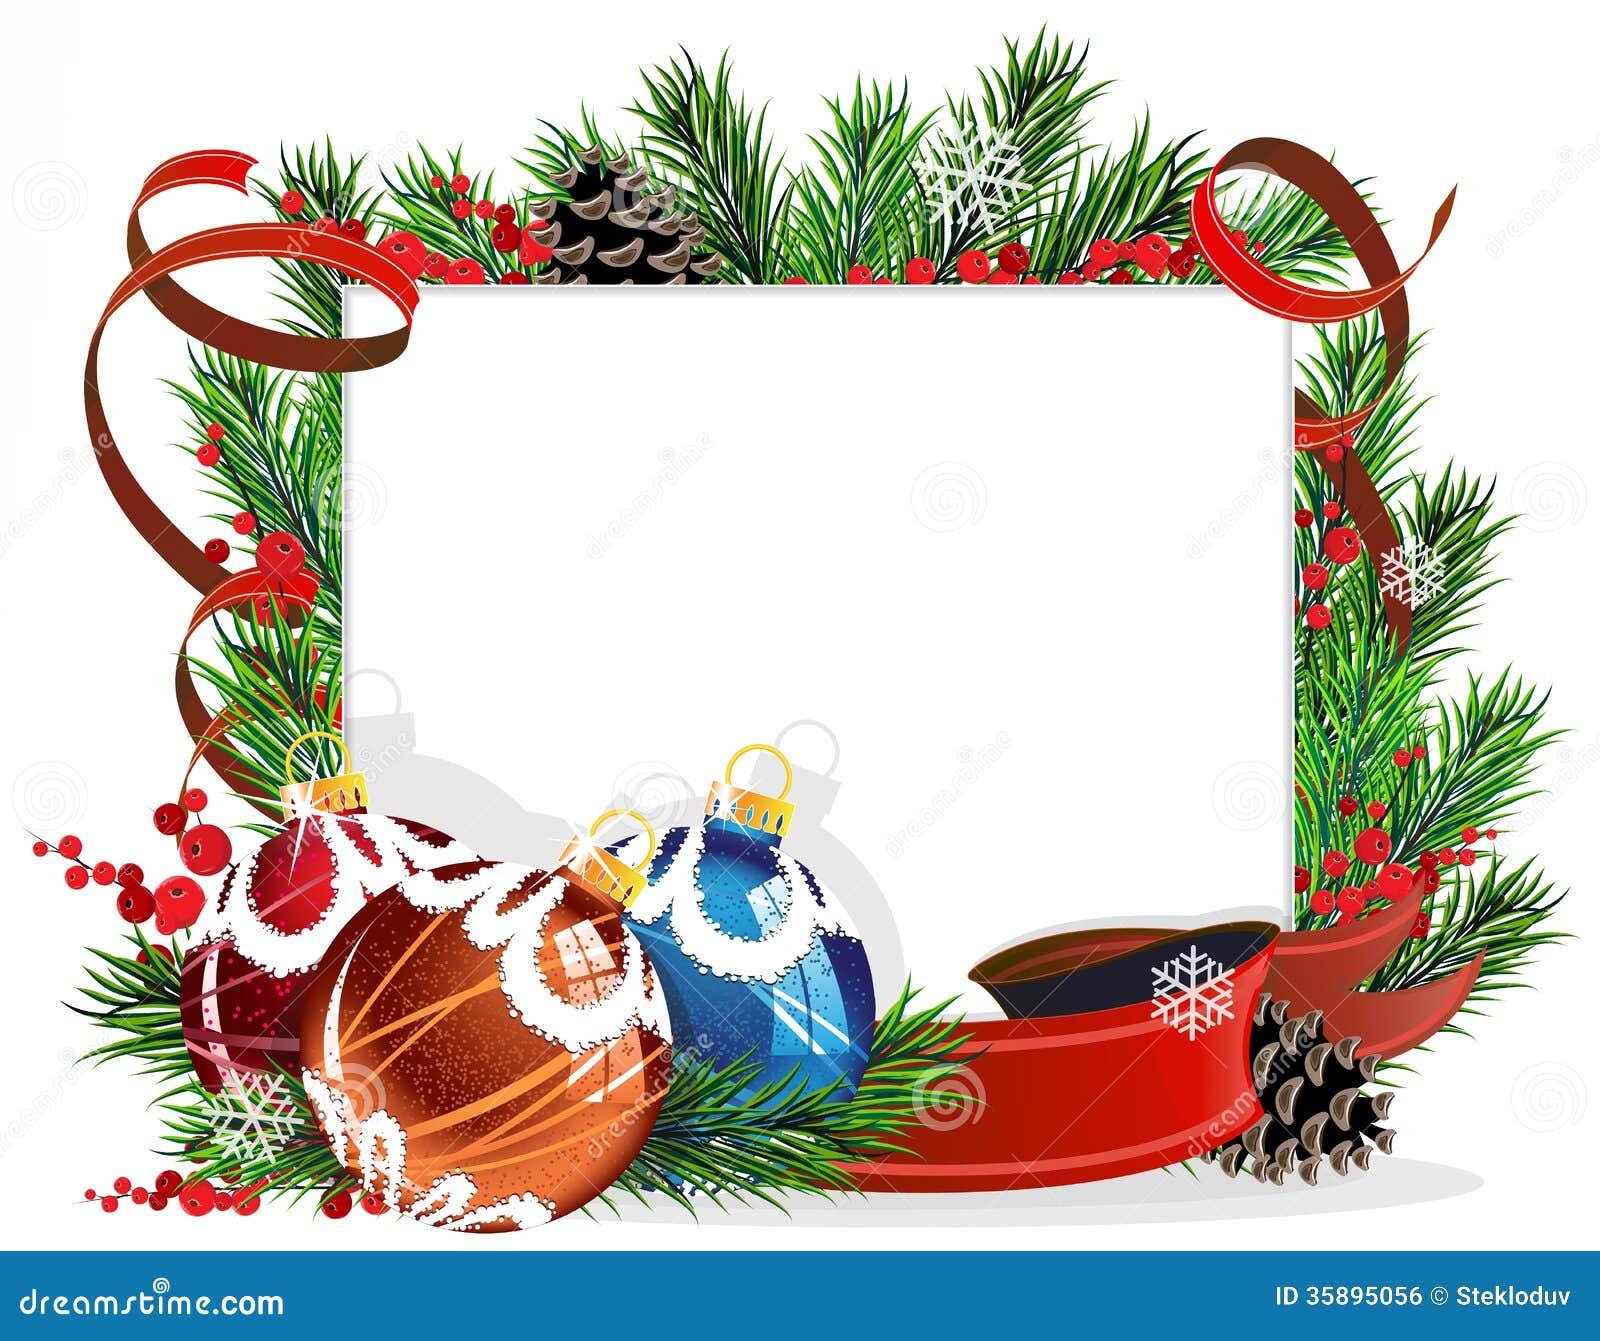 Christmas Tree Decorations Red Ribbon : Christmas decorations with red ribbon the thomas kinkade